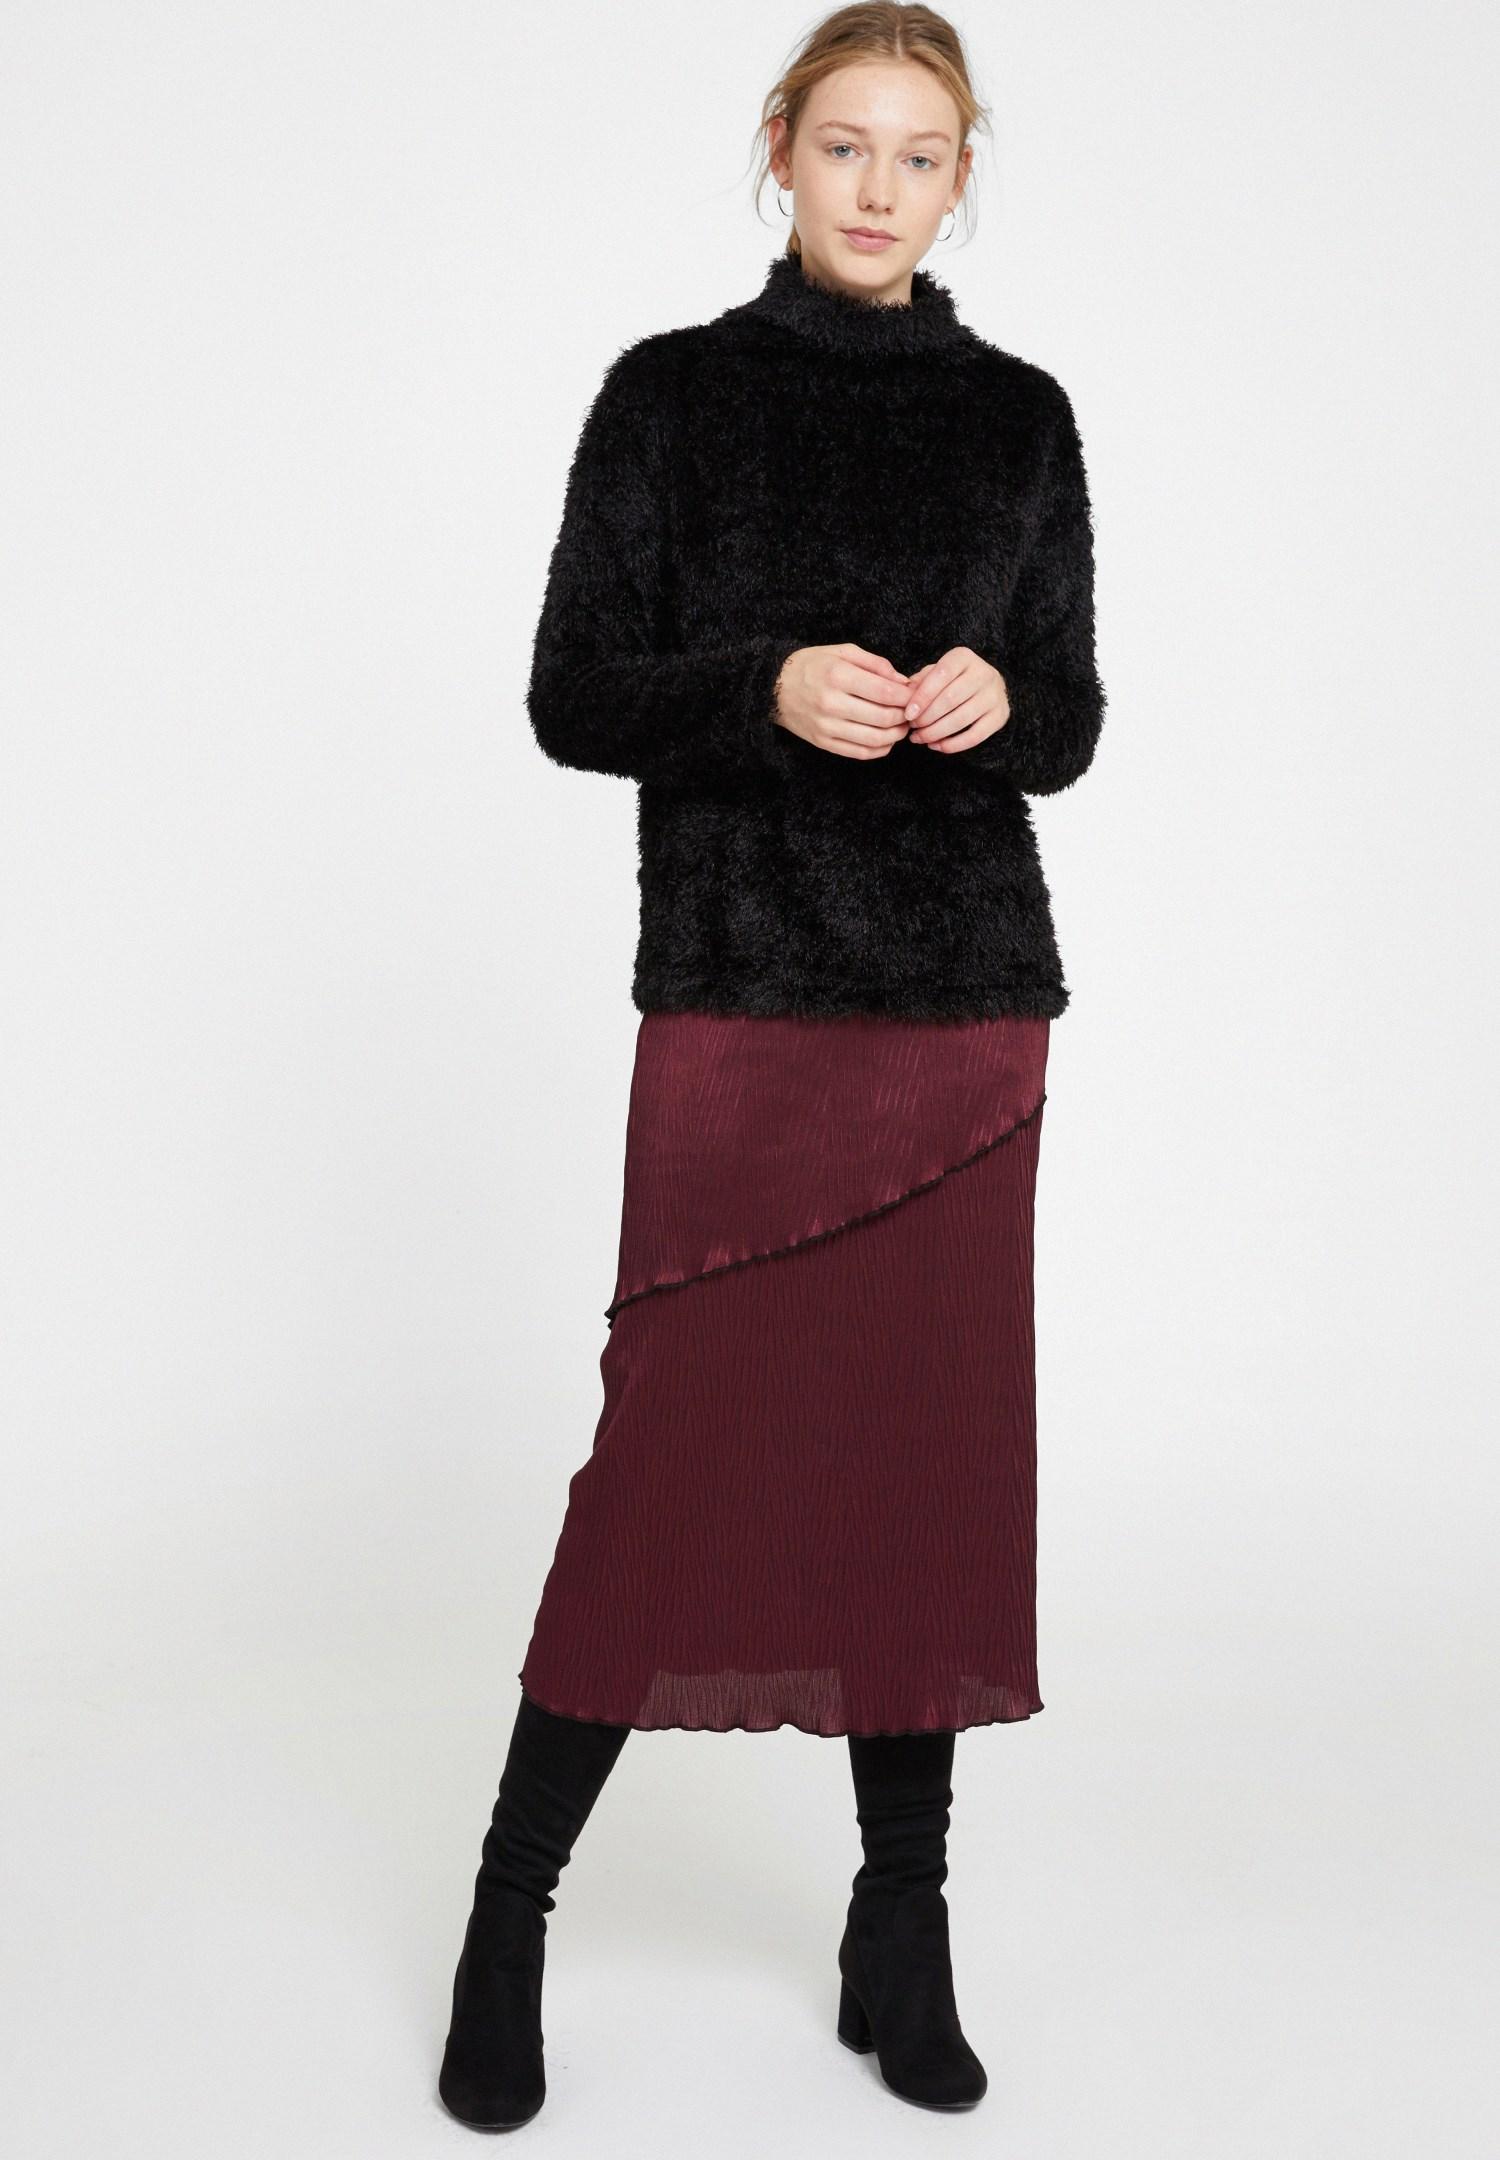 Bayan Siyah Boğazlı Tüy Detaylı Triko